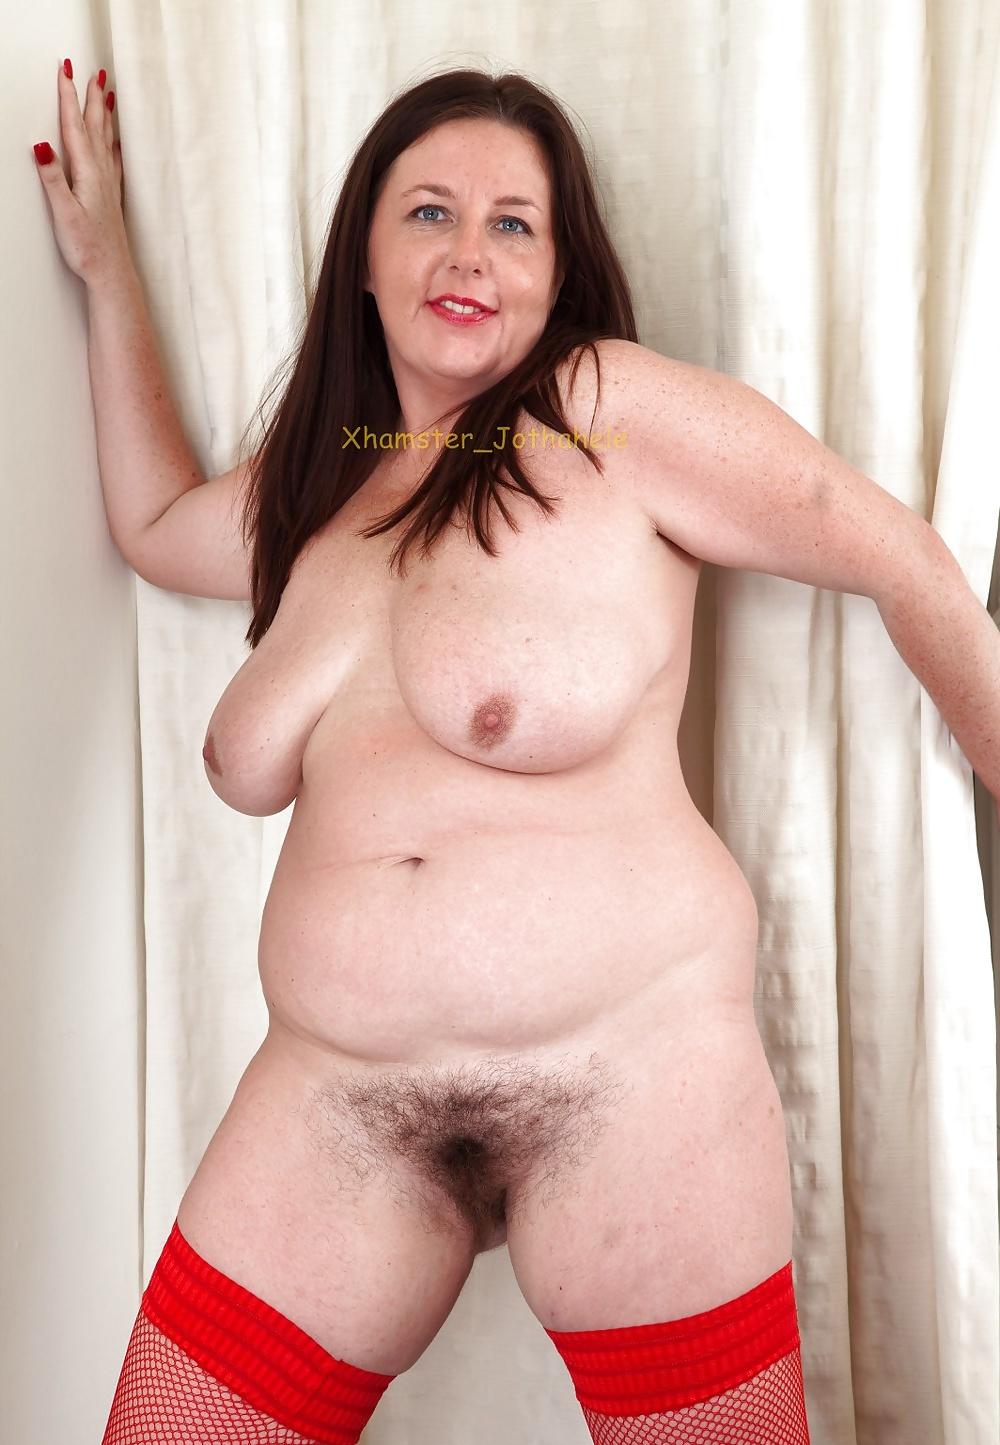 hairy-mature-nudes